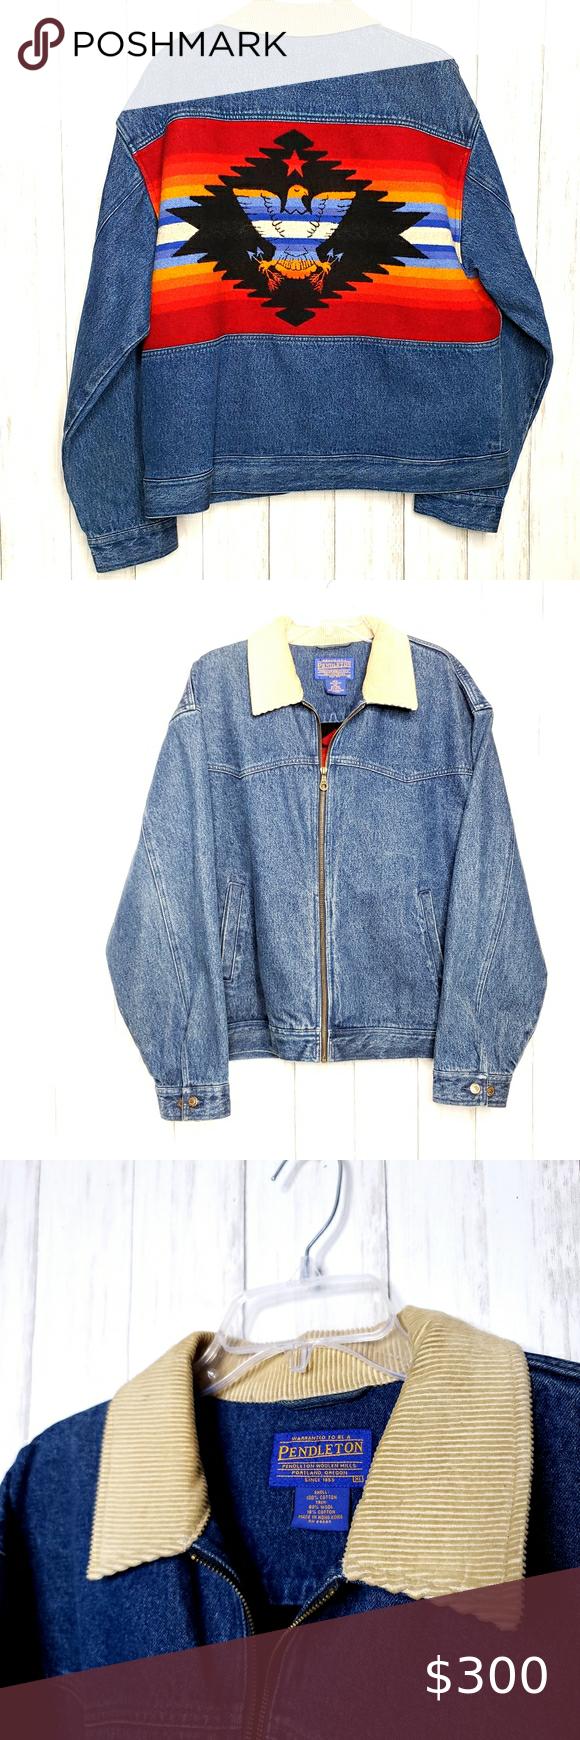 Vintage Pendleton Denim Jacket In 2021 Denim Sweater Jacket Vintage Denim Fashion [ 1740 x 580 Pixel ]